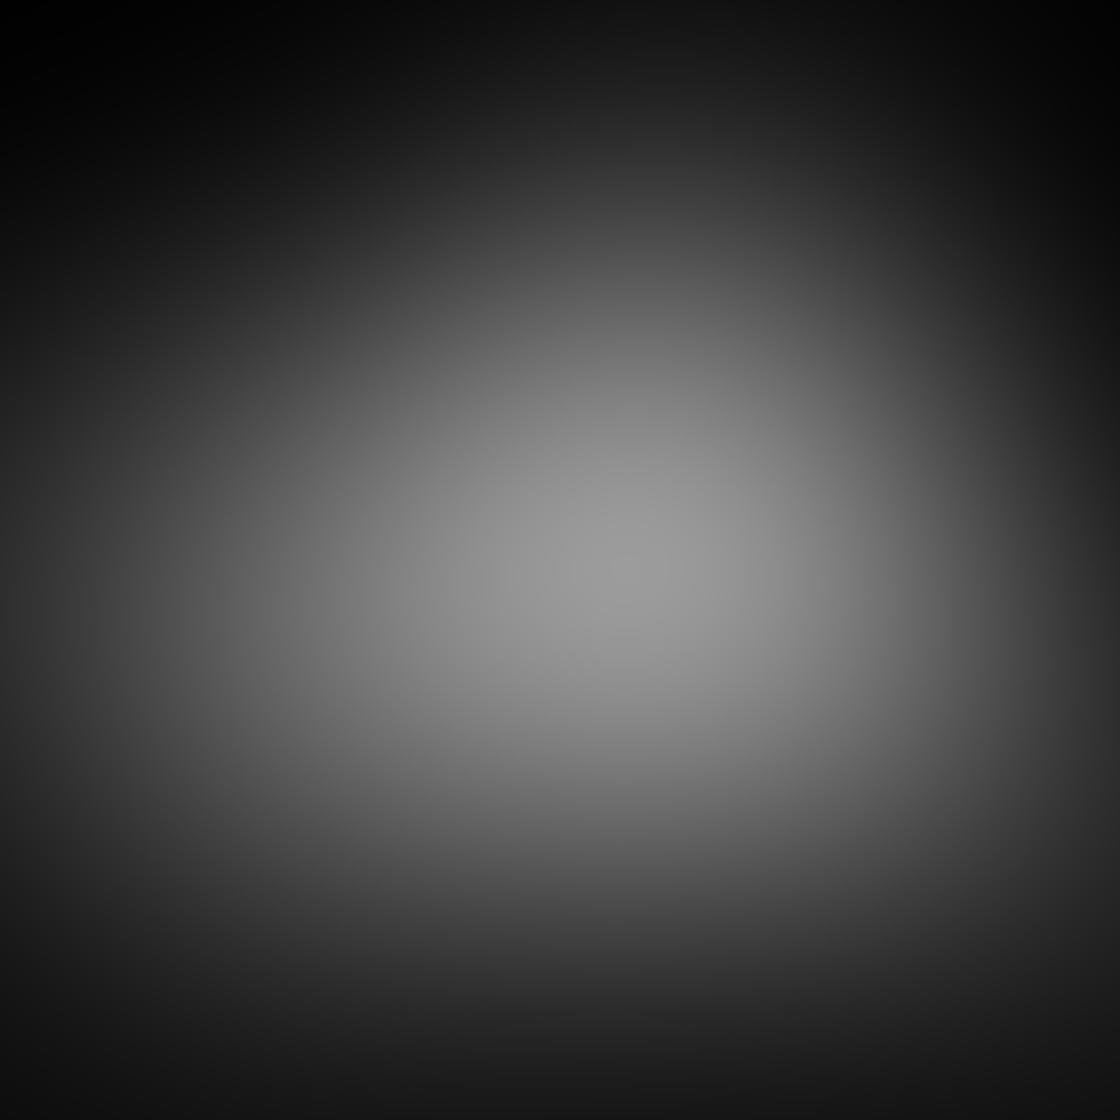 iPhone Photos Black White 21